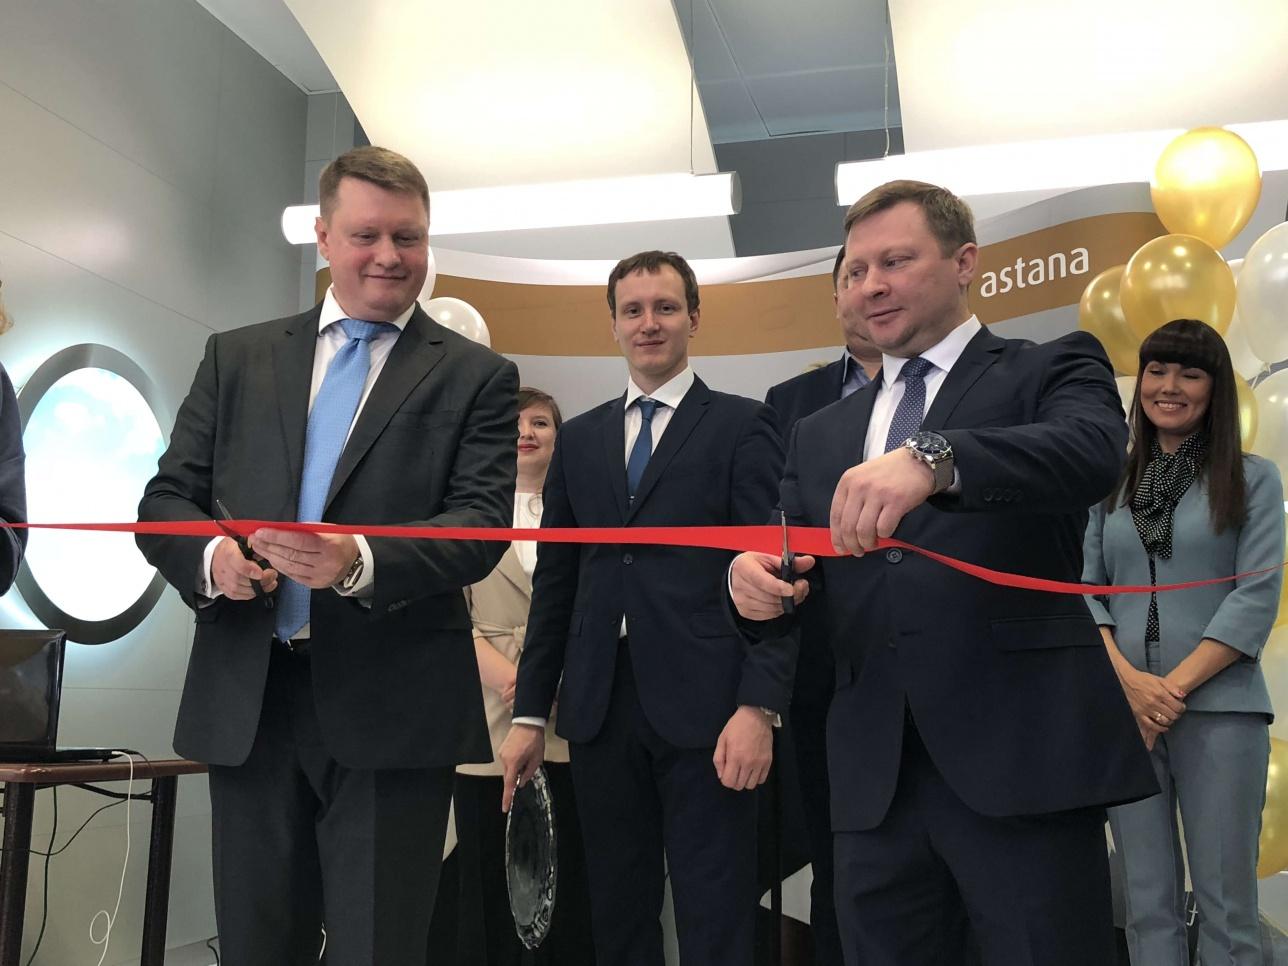 Авиарейс Астана Тюмень запустили 2 июня